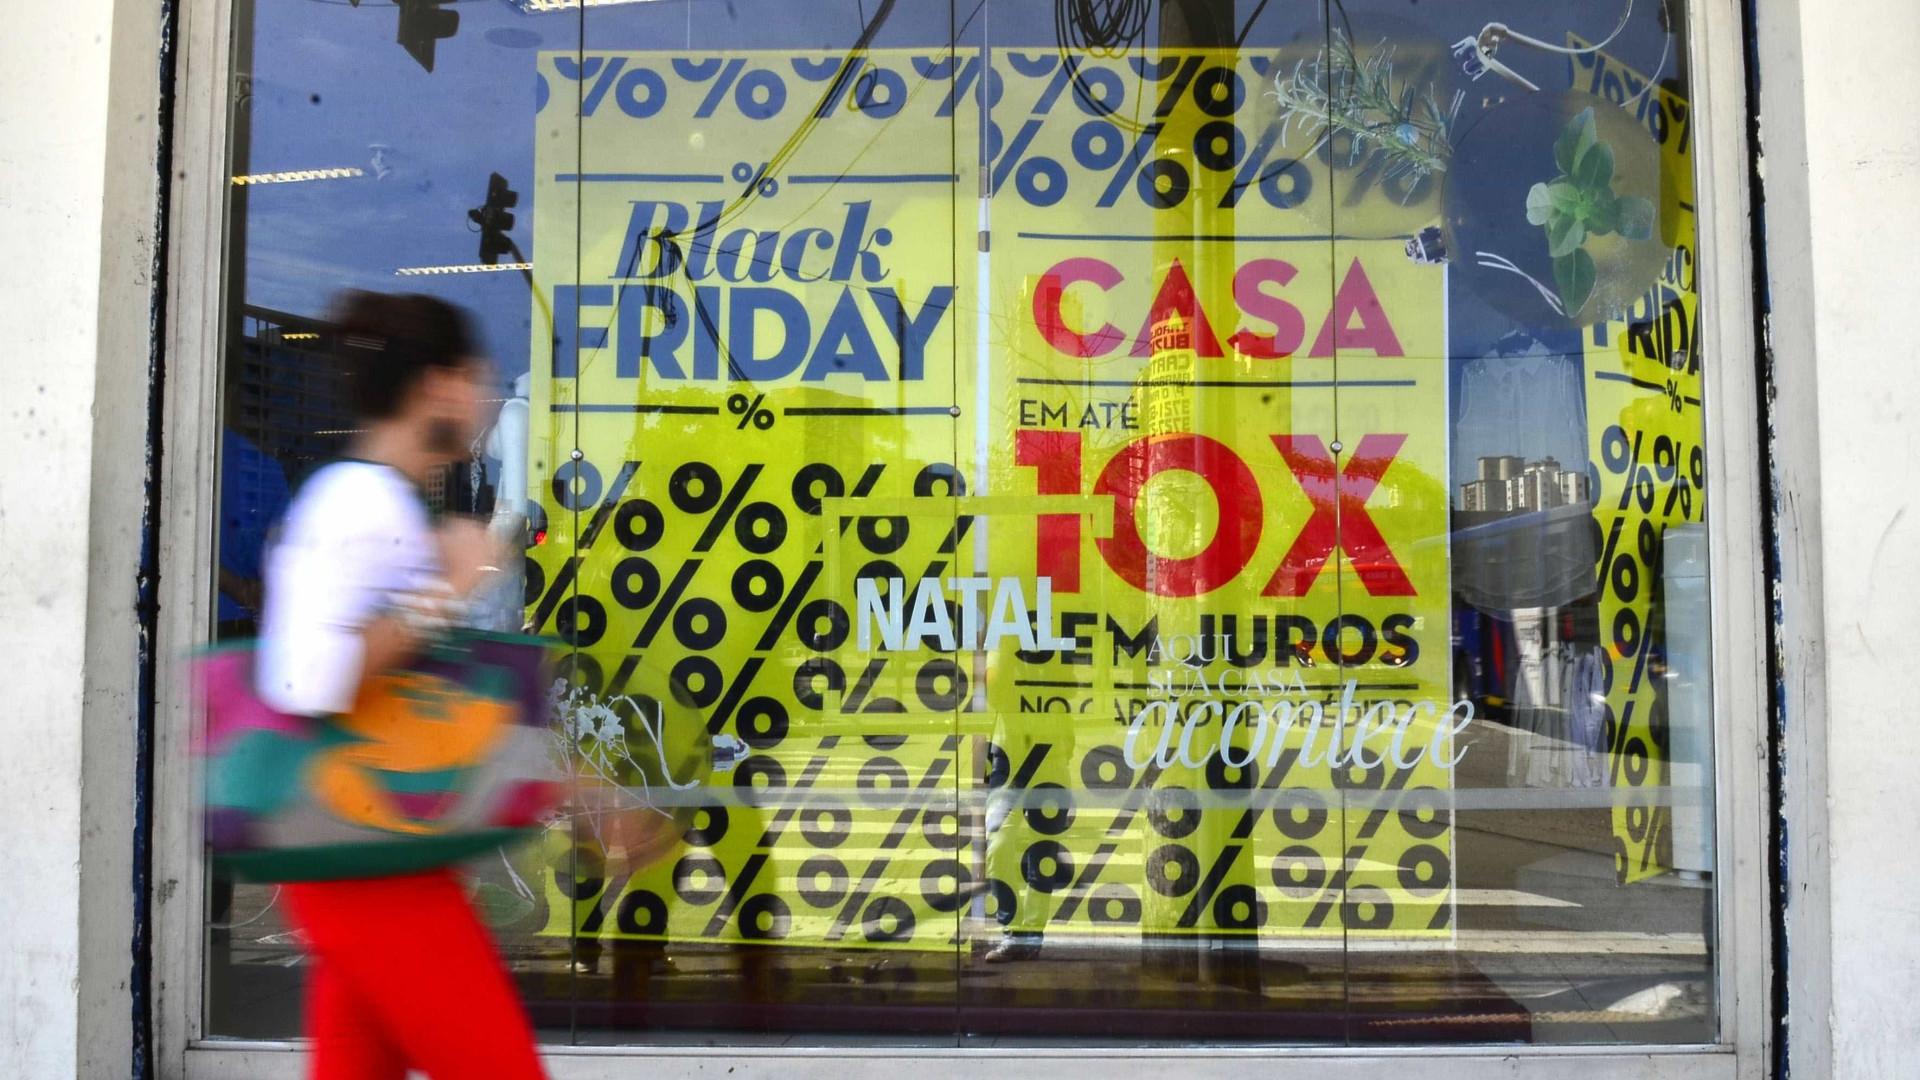 Black Friday deve movimentar R$ 3,27 bilhões no Brasil